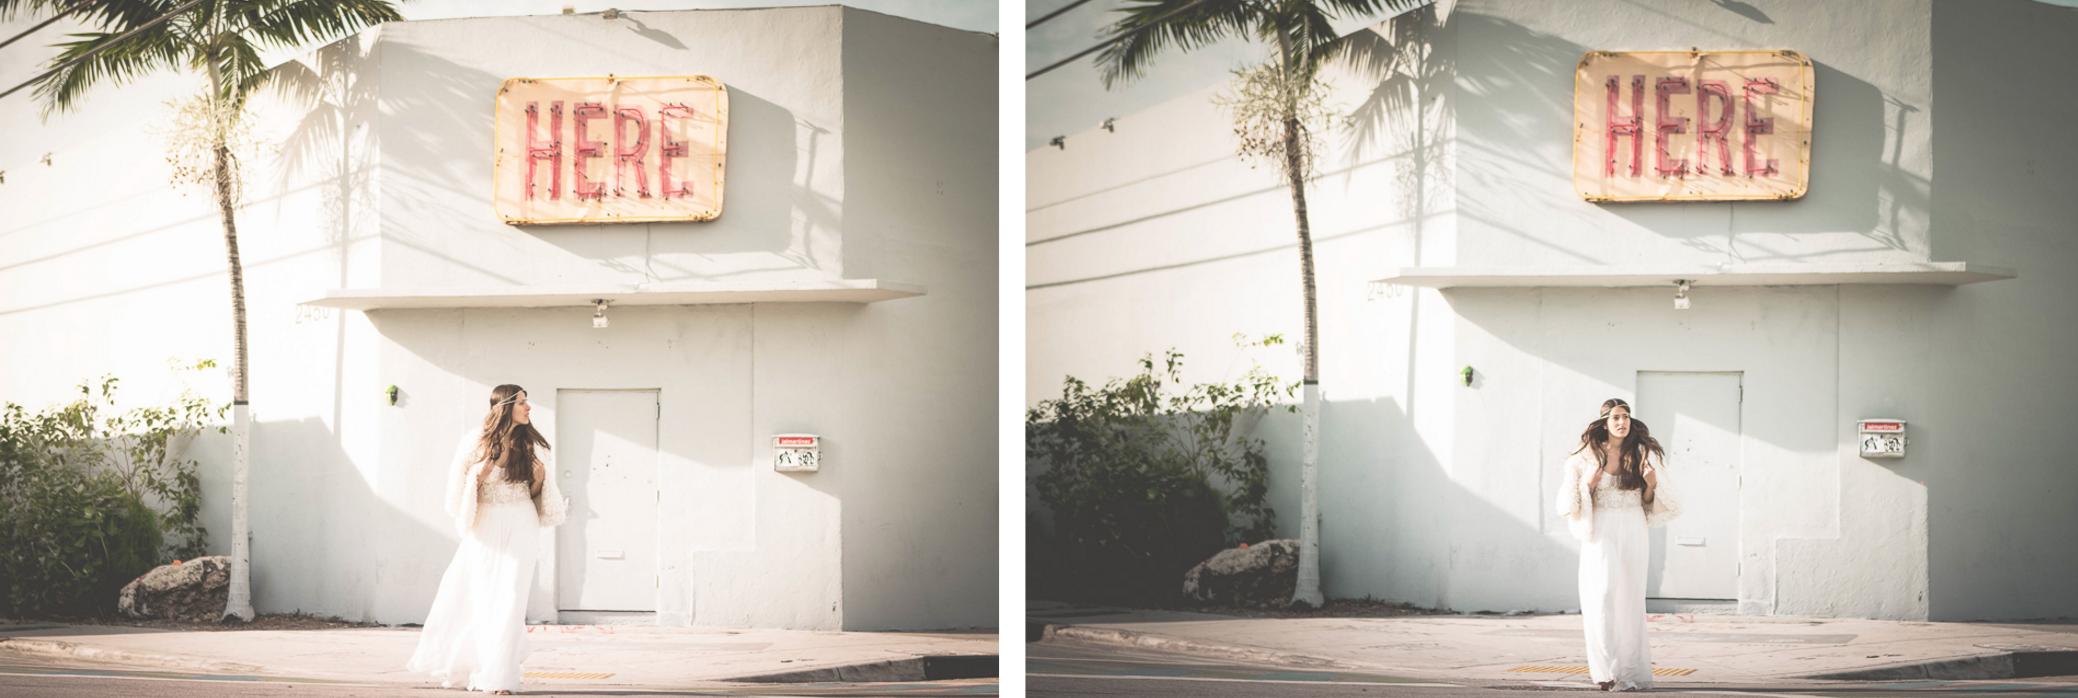 Bridal Inspiration Styled Shoot at Wynwood Walls - The Creatives Loft Miami Wedding Planner